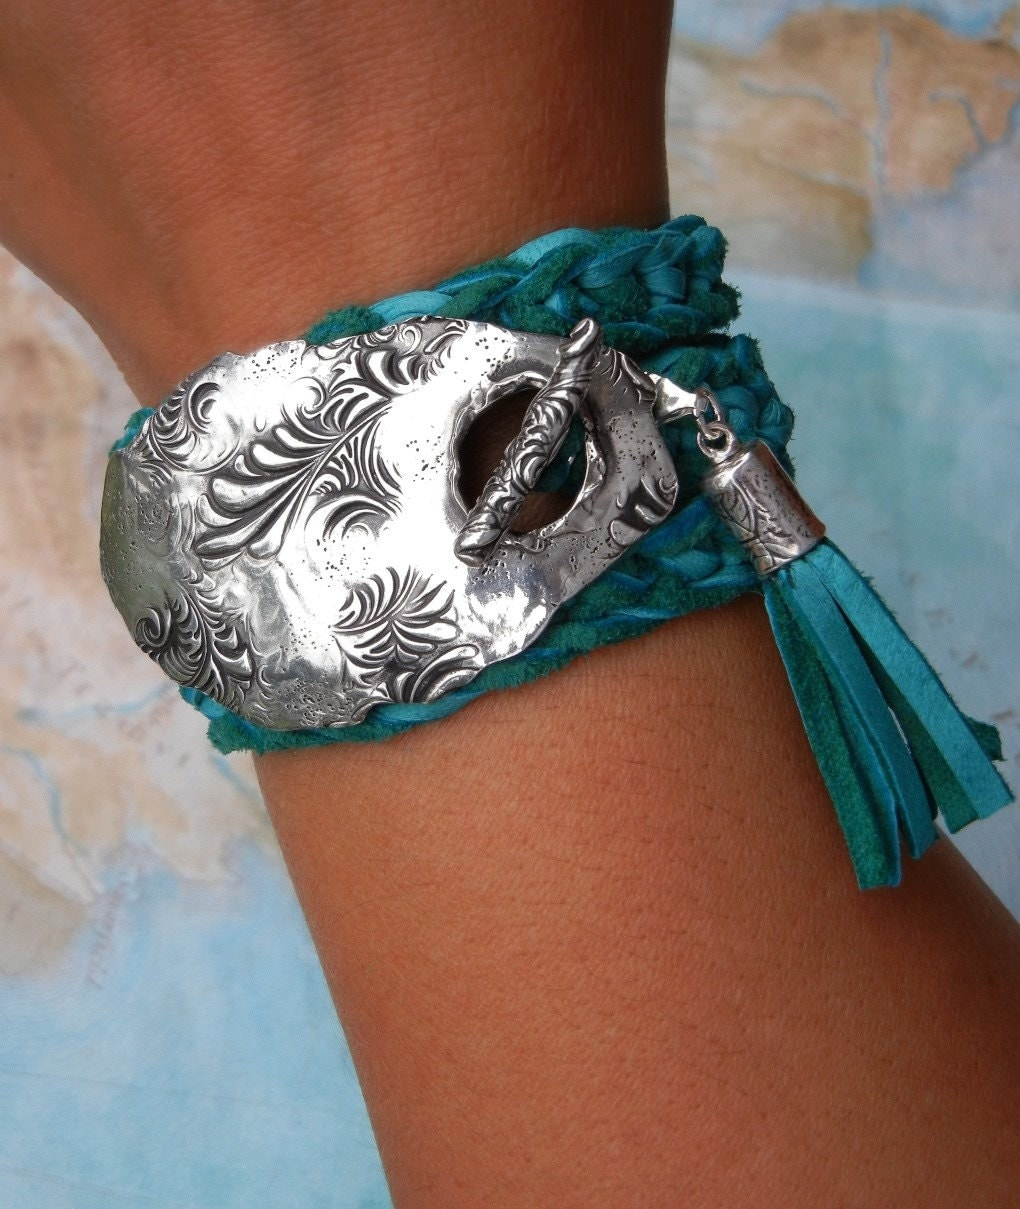 turquoise jewelry turquoise leather bracelet genuine. Black Bedroom Furniture Sets. Home Design Ideas